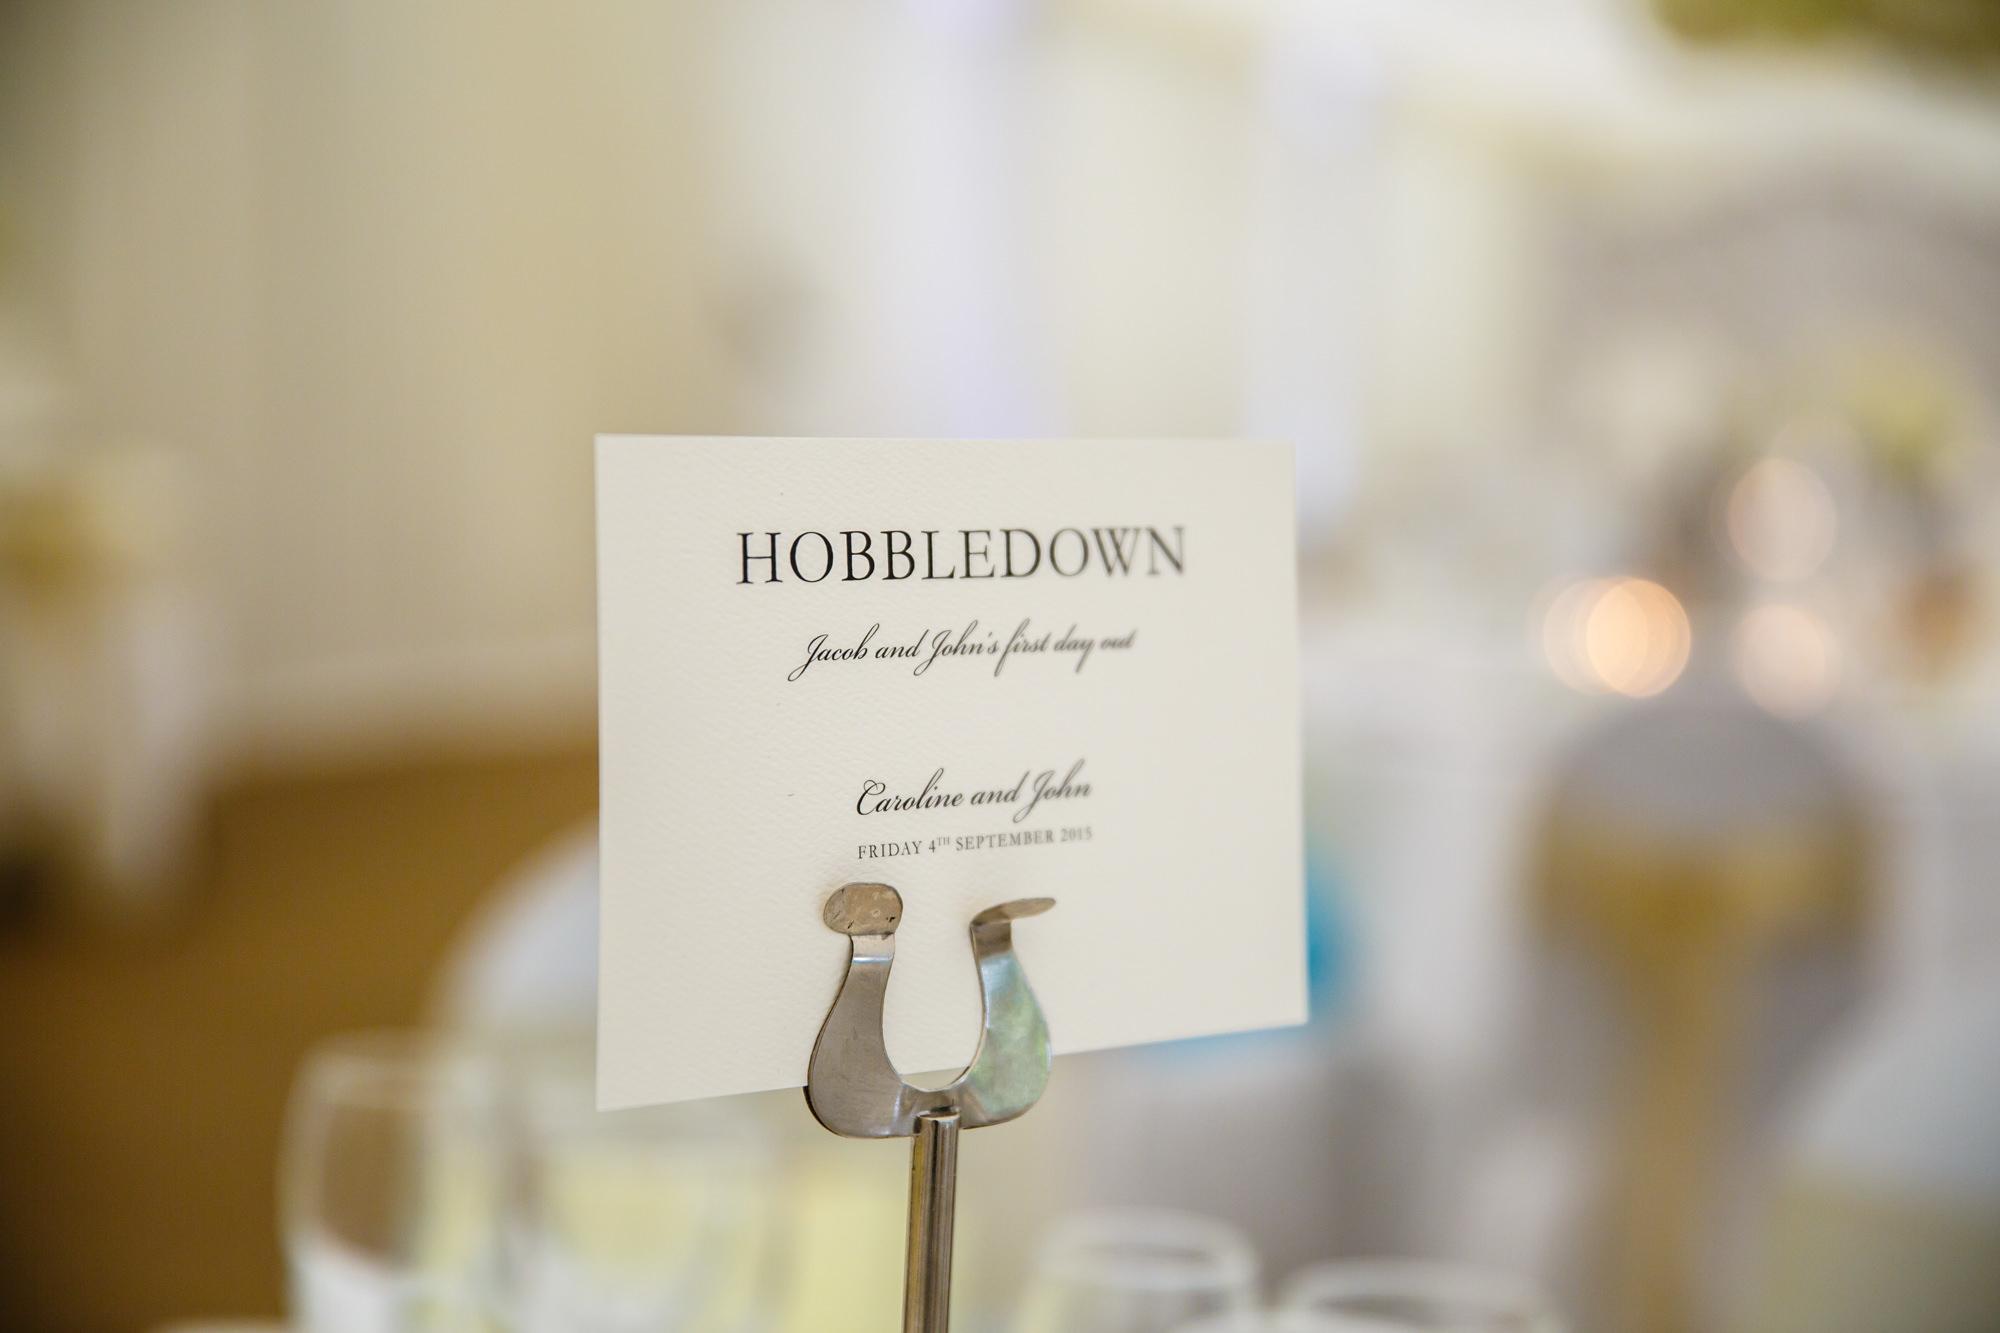 Parklands Quendon Hall Wedding room set up